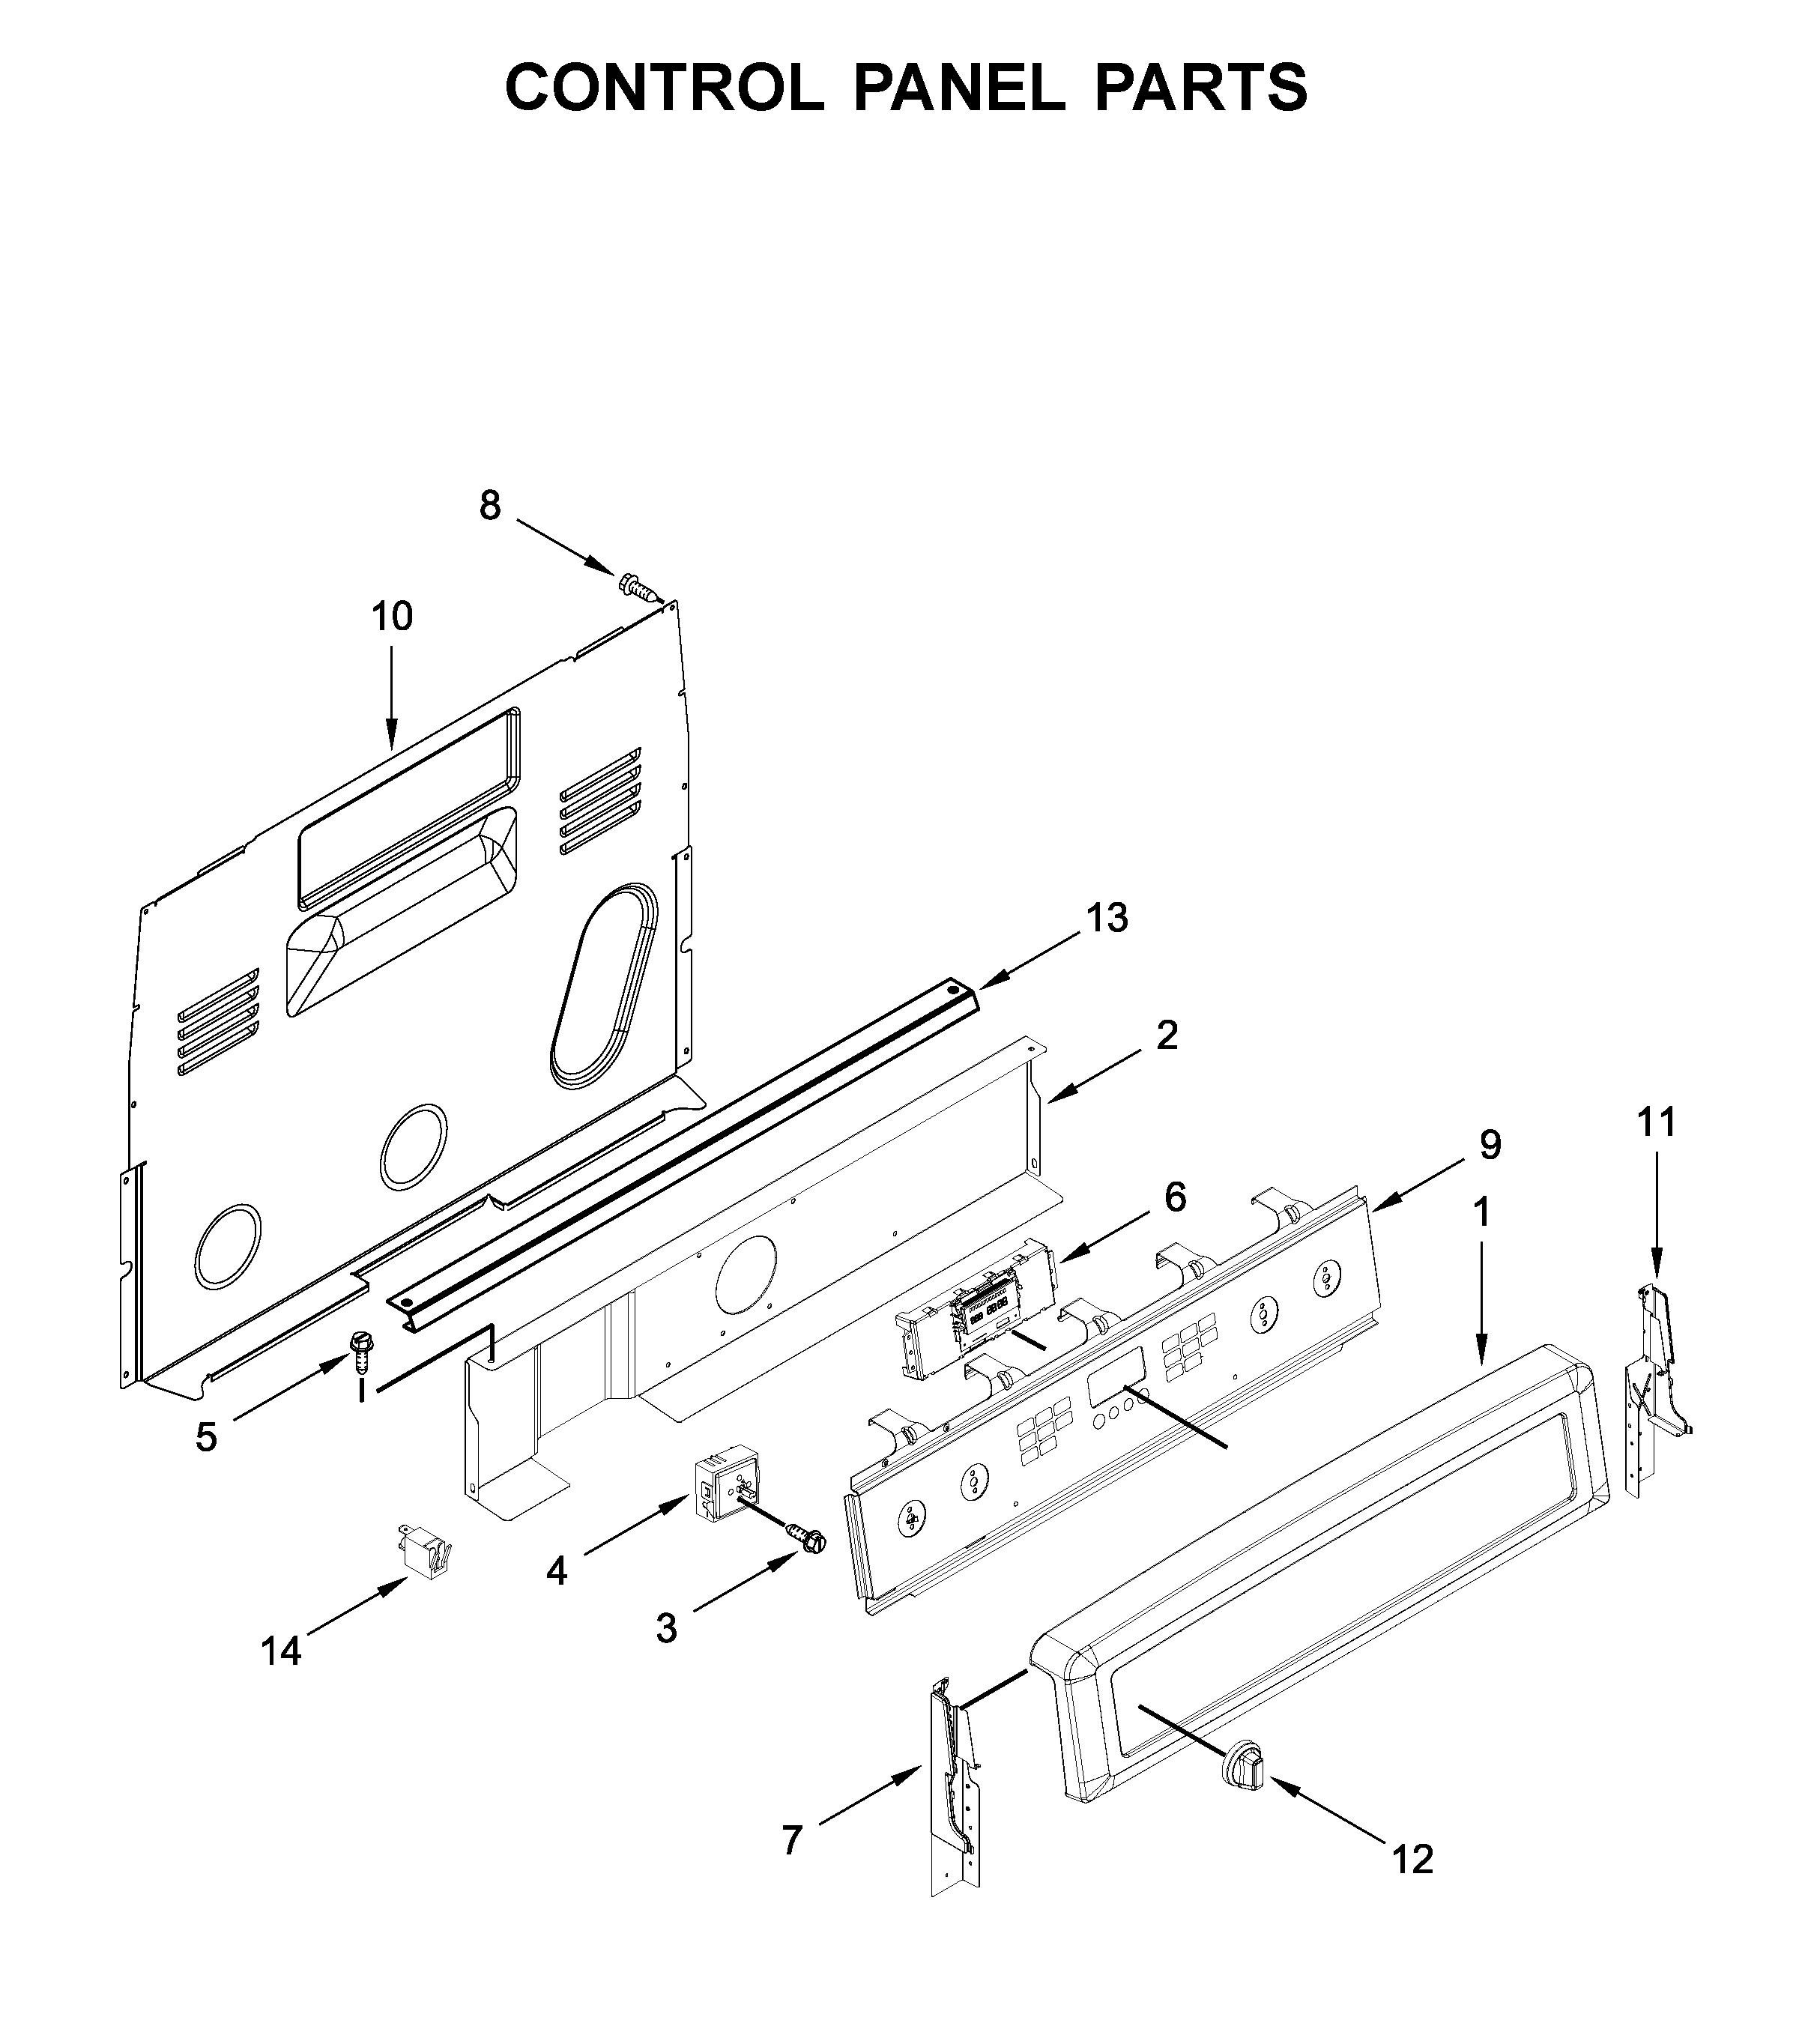 Maytag  Electric Range  Control panel parts